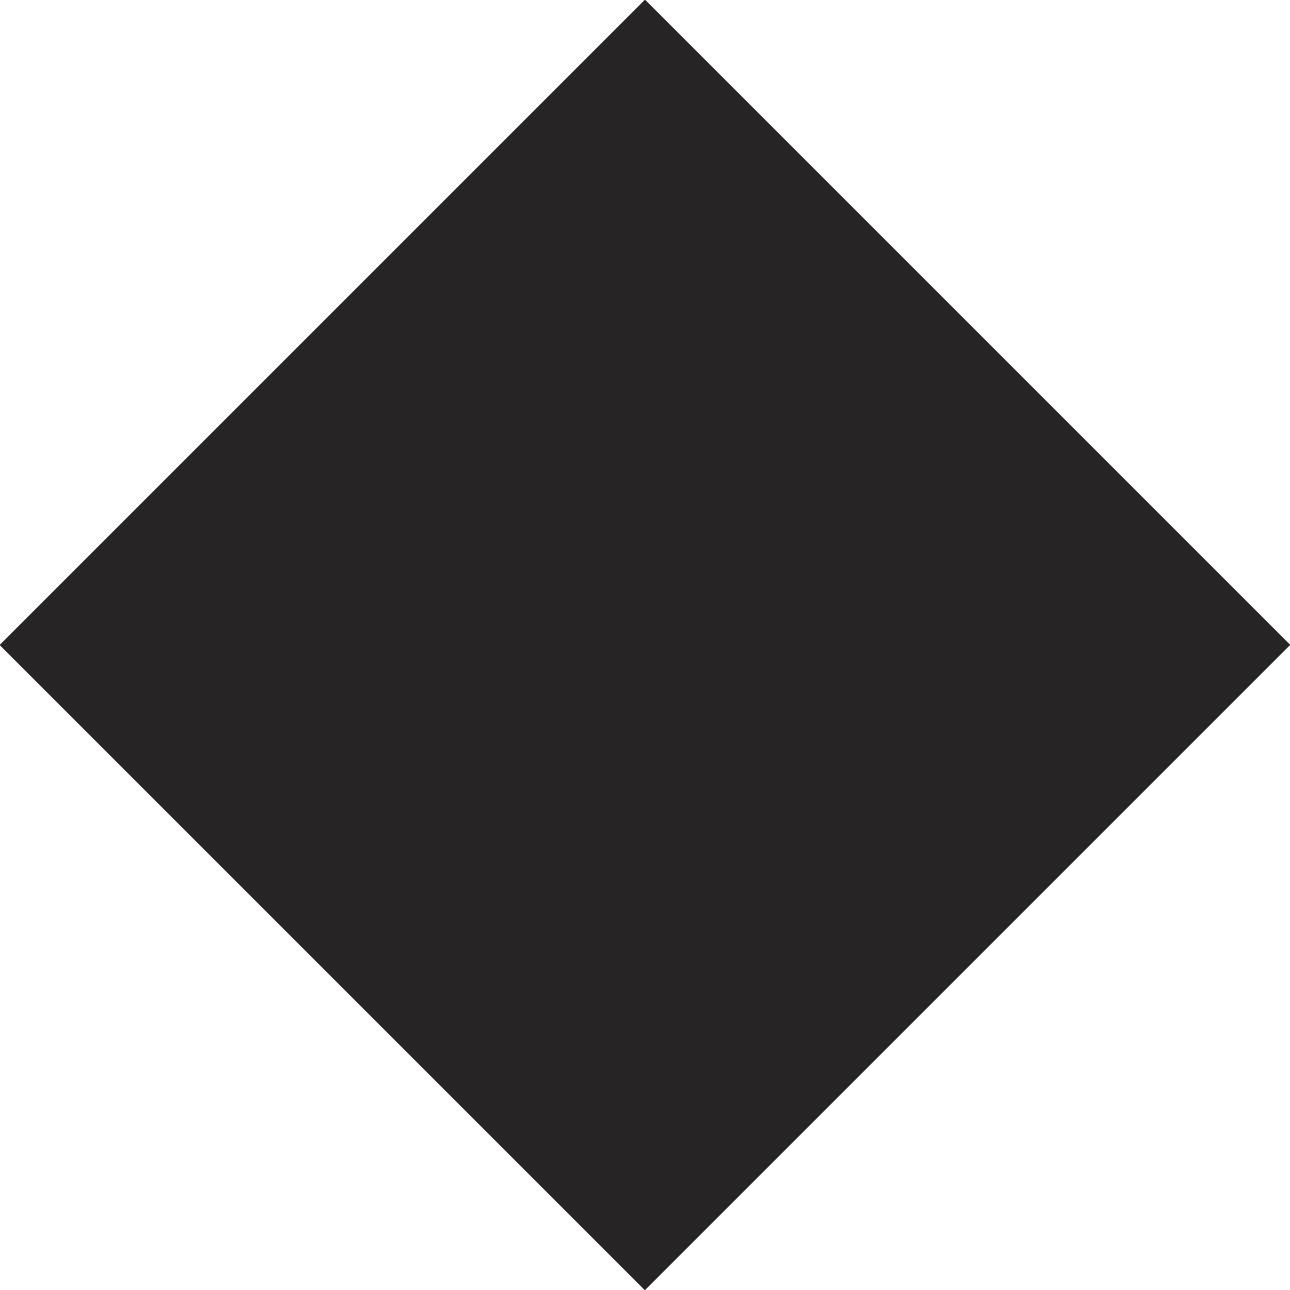 diamond clipart diamond shape